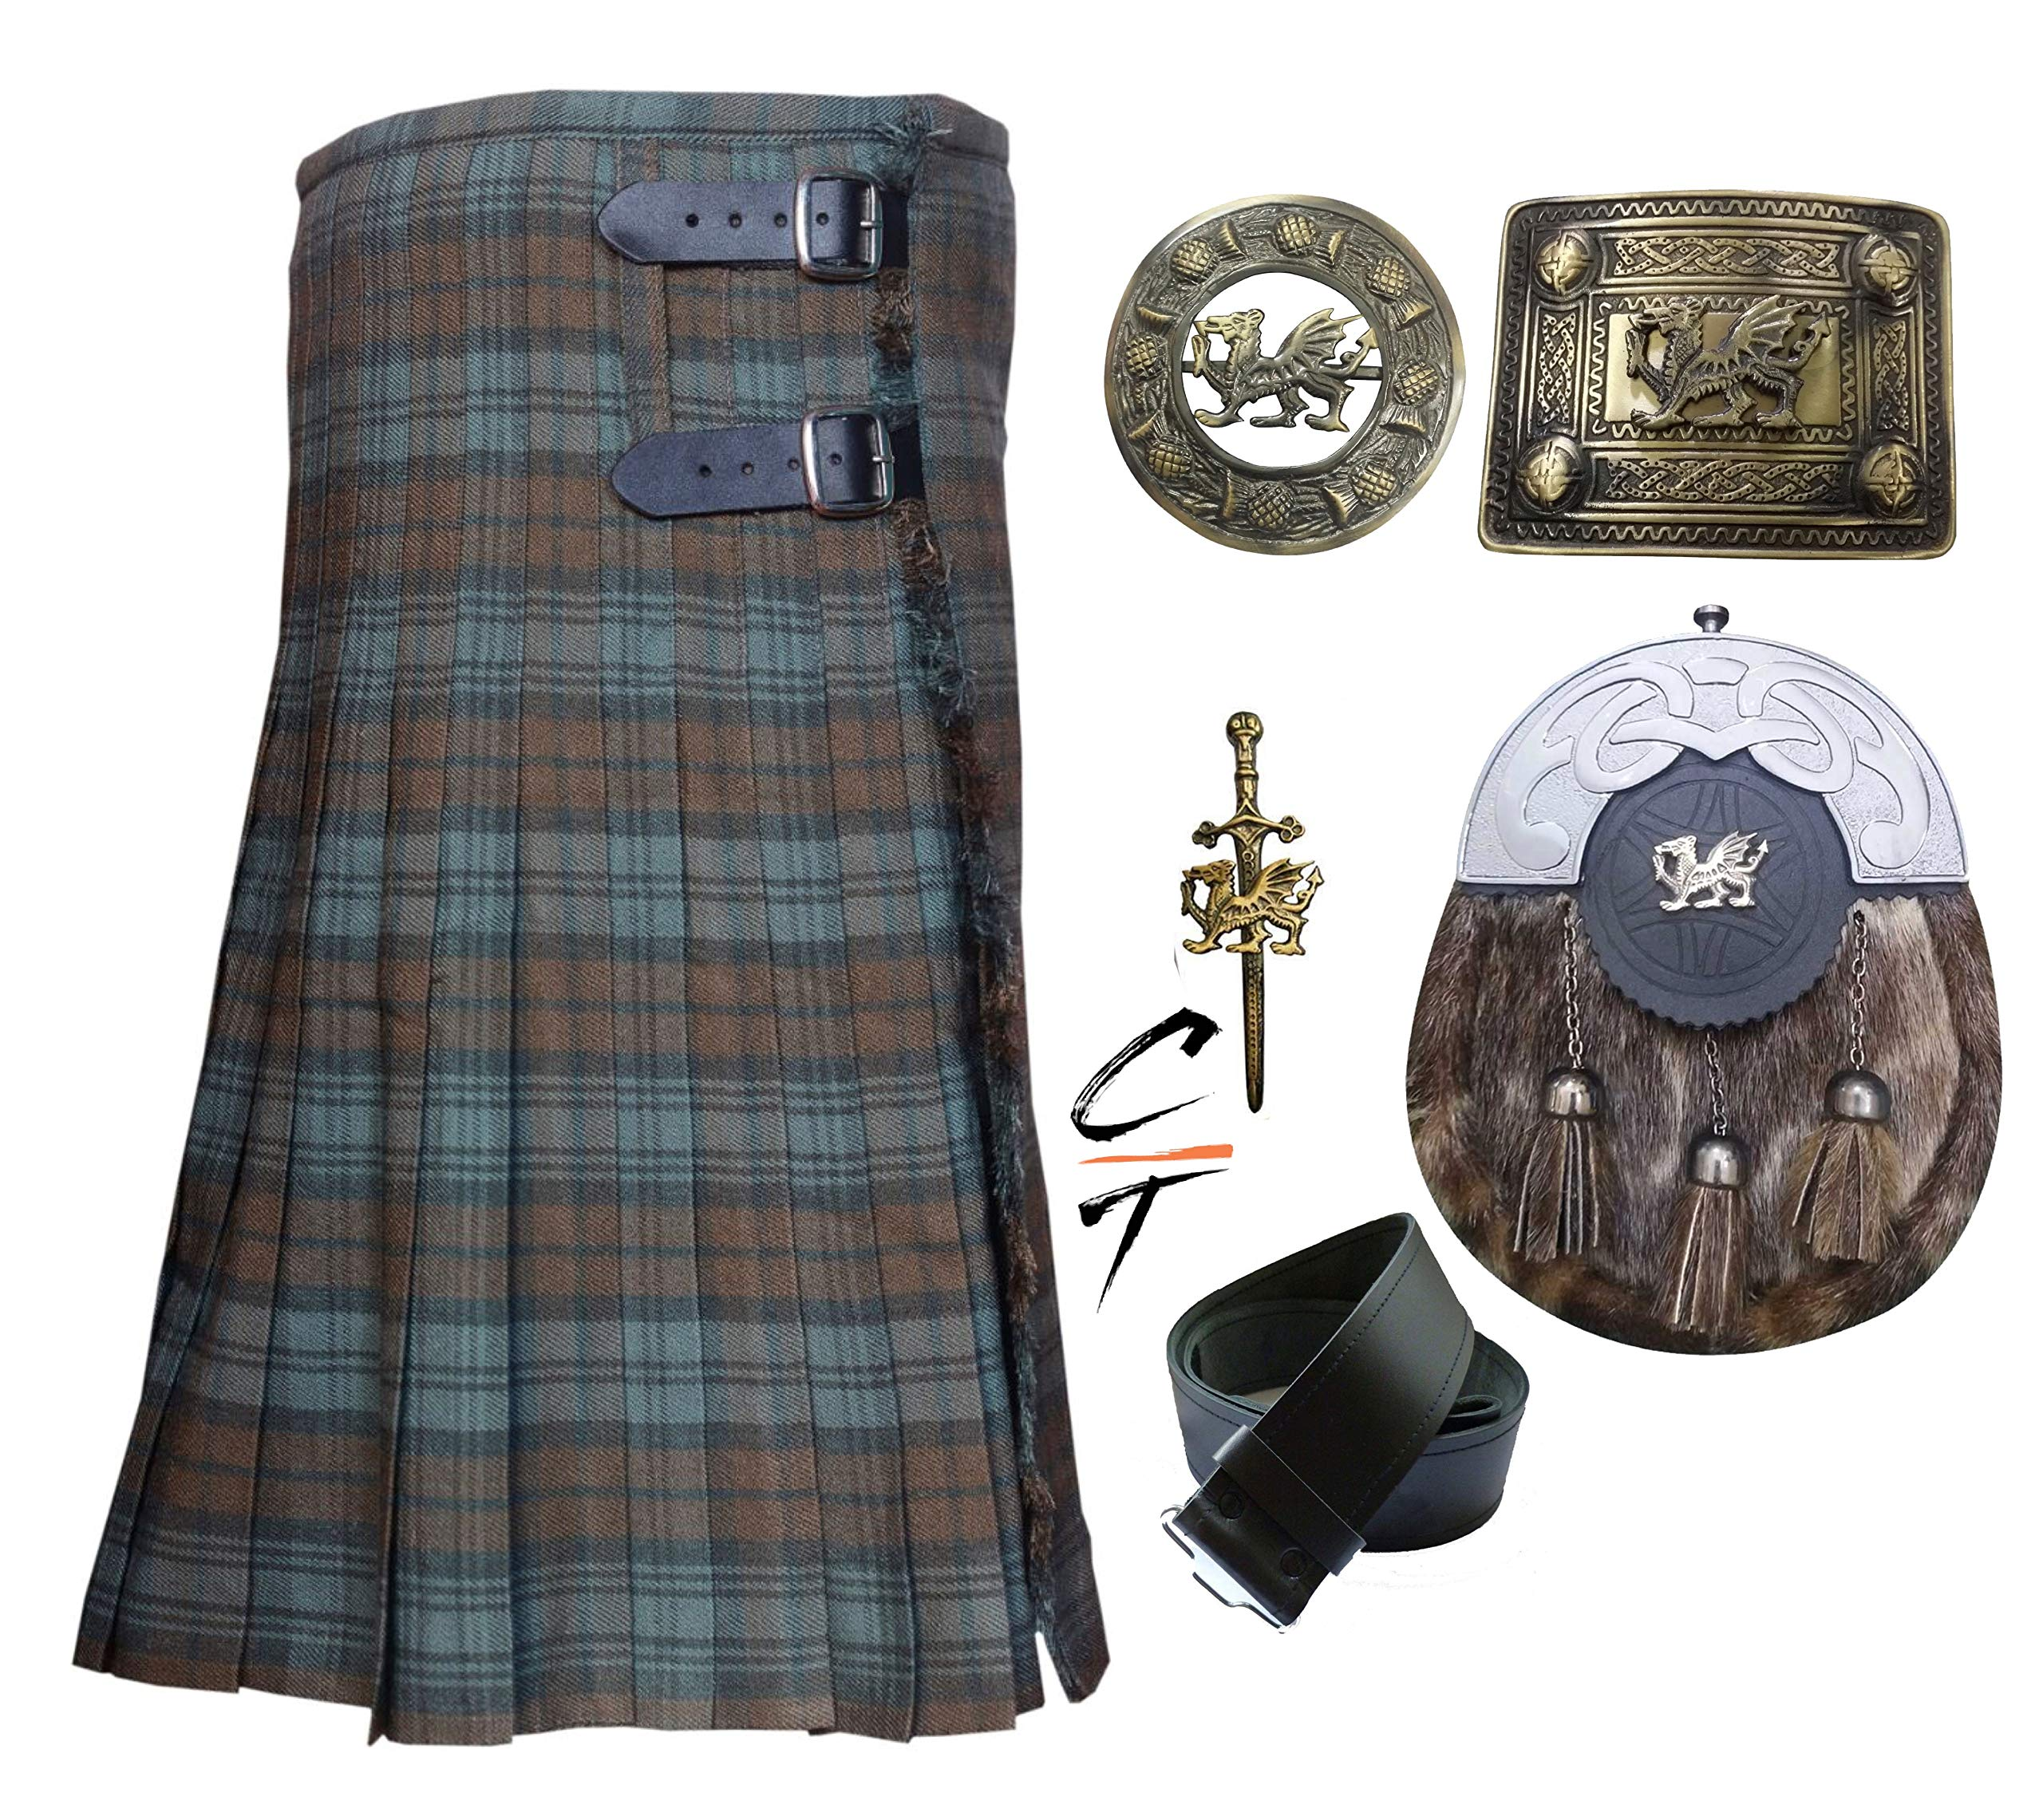 CT Men's Scottish 8 Yards 16oz Kilt Weathered Black Watch Tartan Acrylic Wool Kilts Outfit Set 6 Pieces (46)